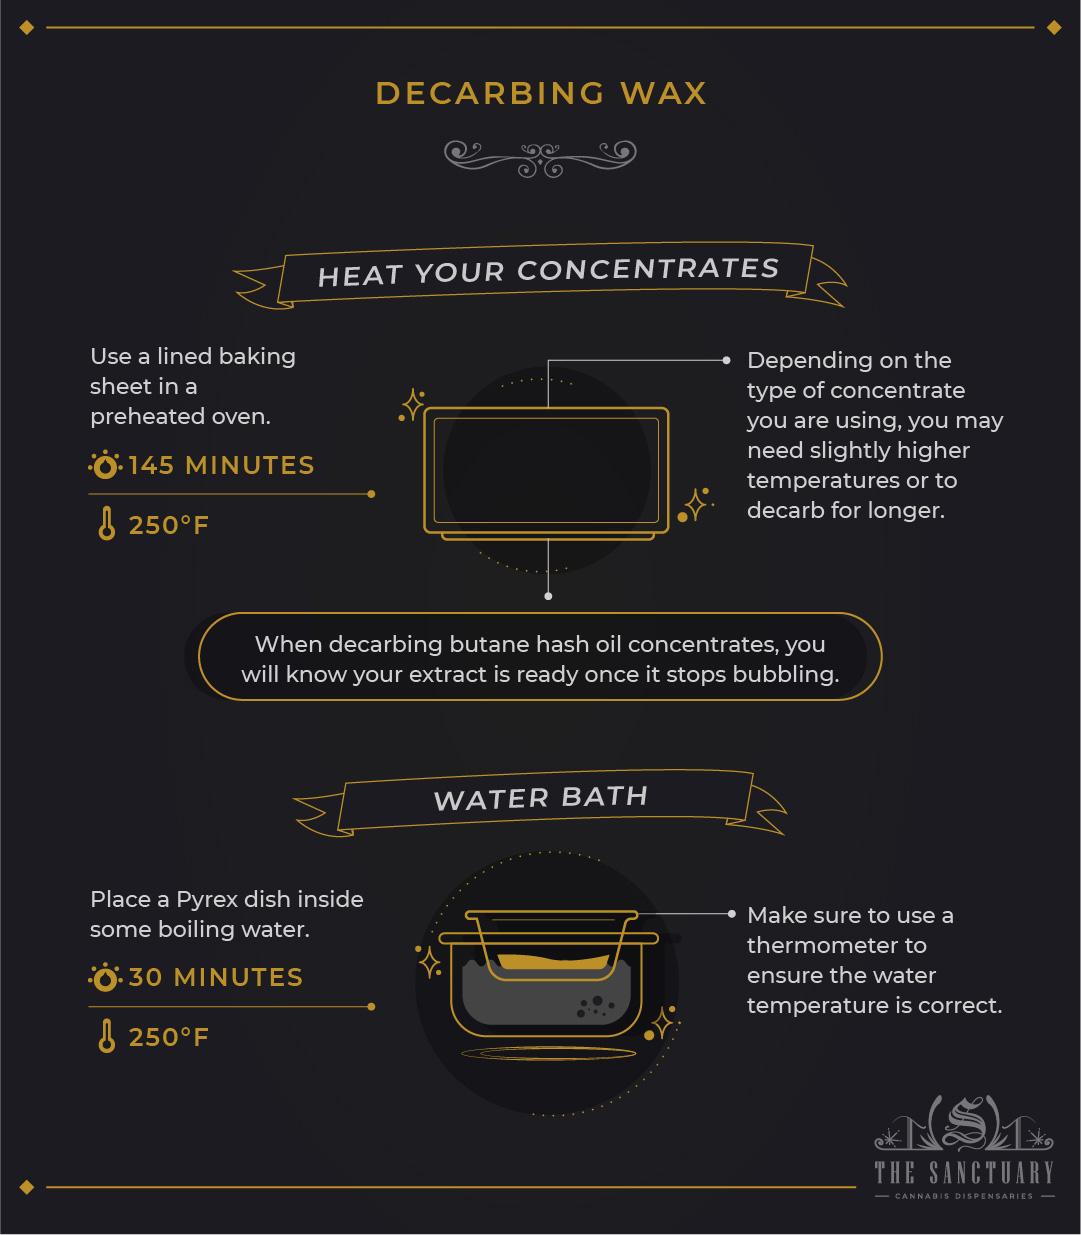 Decarbing wax